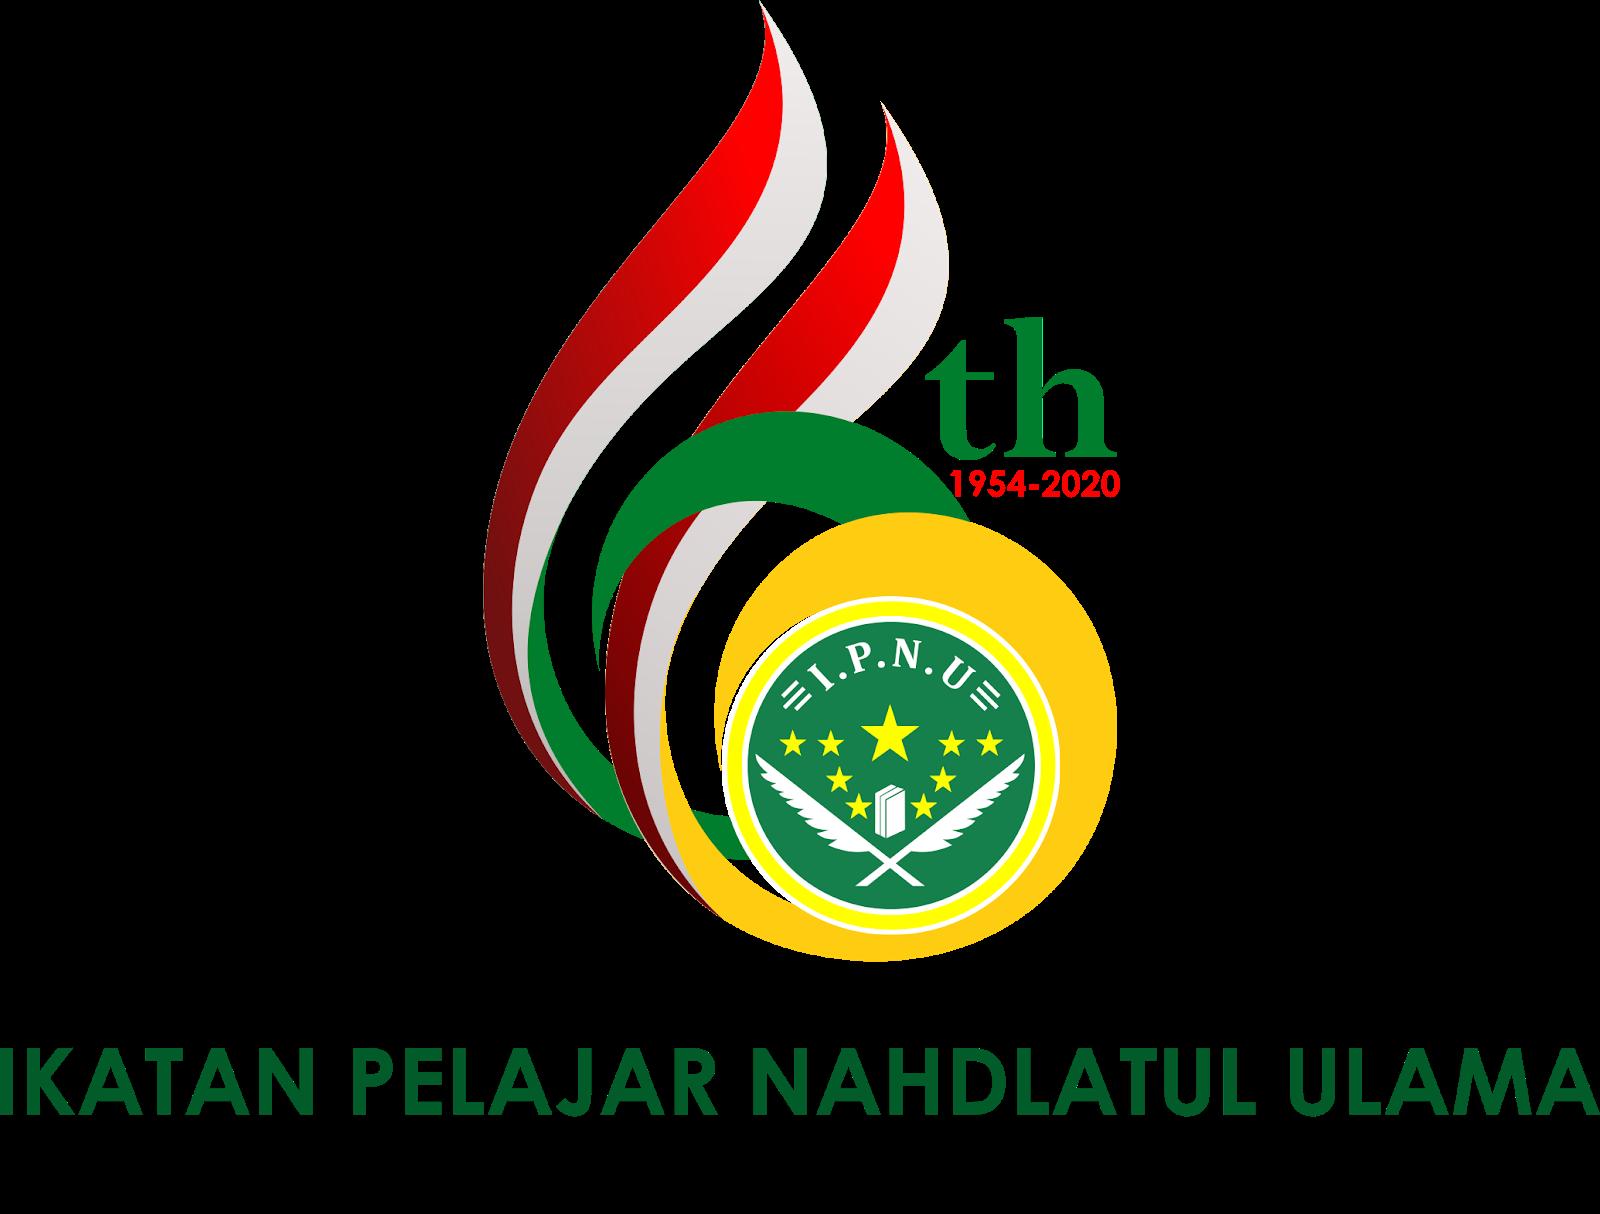 Logo Ippnu Terbaru 40